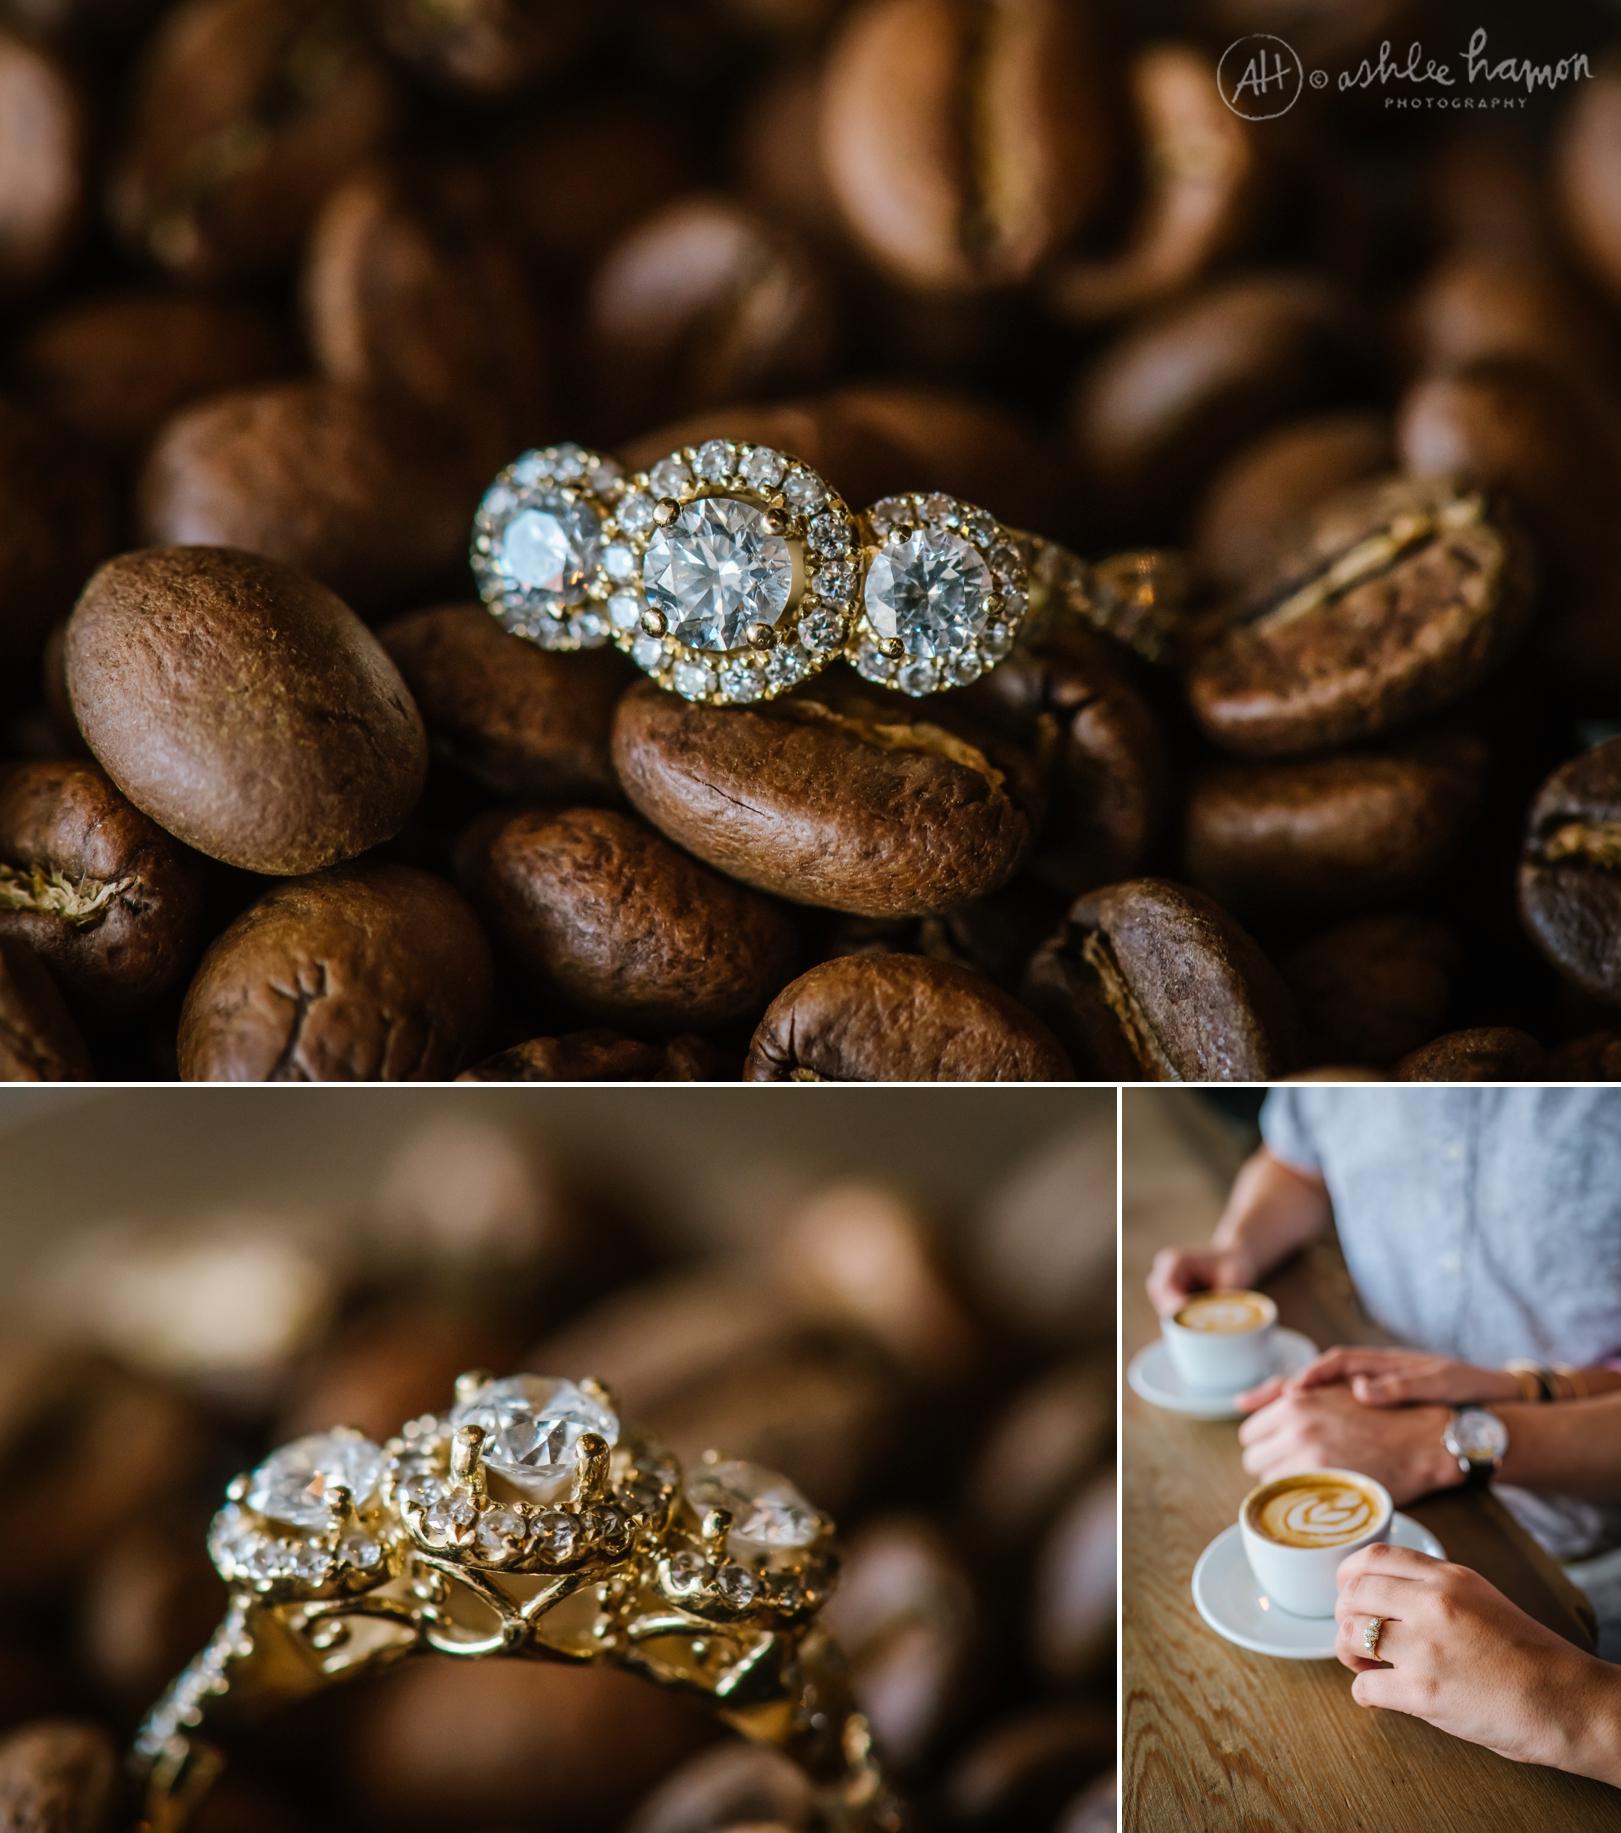 ashlee-hamon-photography-tampa-buddy-brew-coffee-shop-engagement_0000.jpg